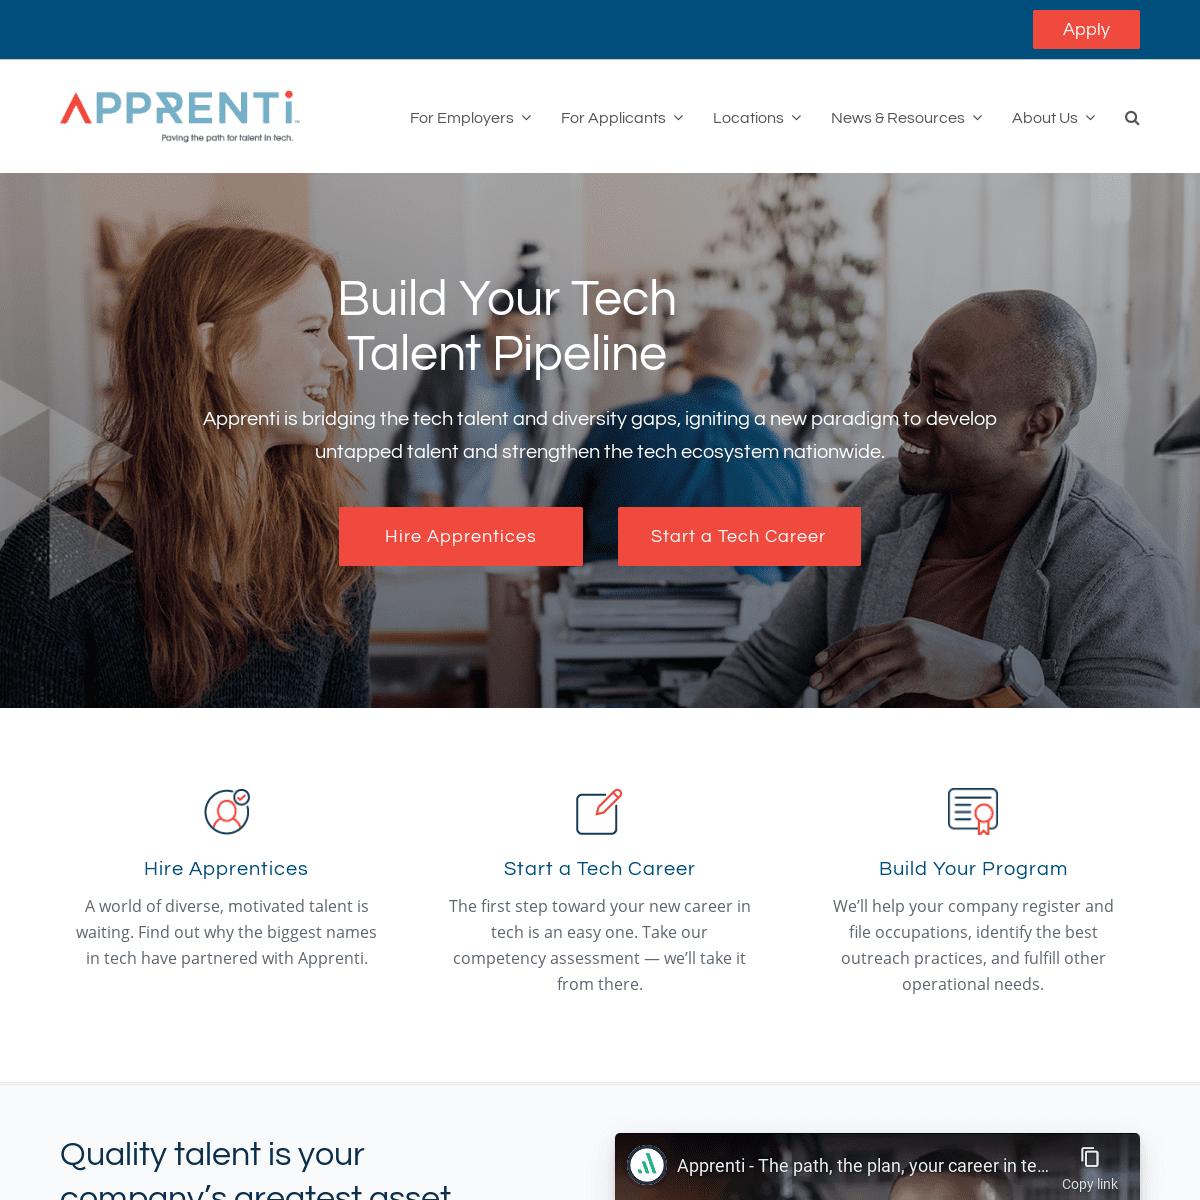 Apprenti - Hire Apprentices, Start a Tech Career